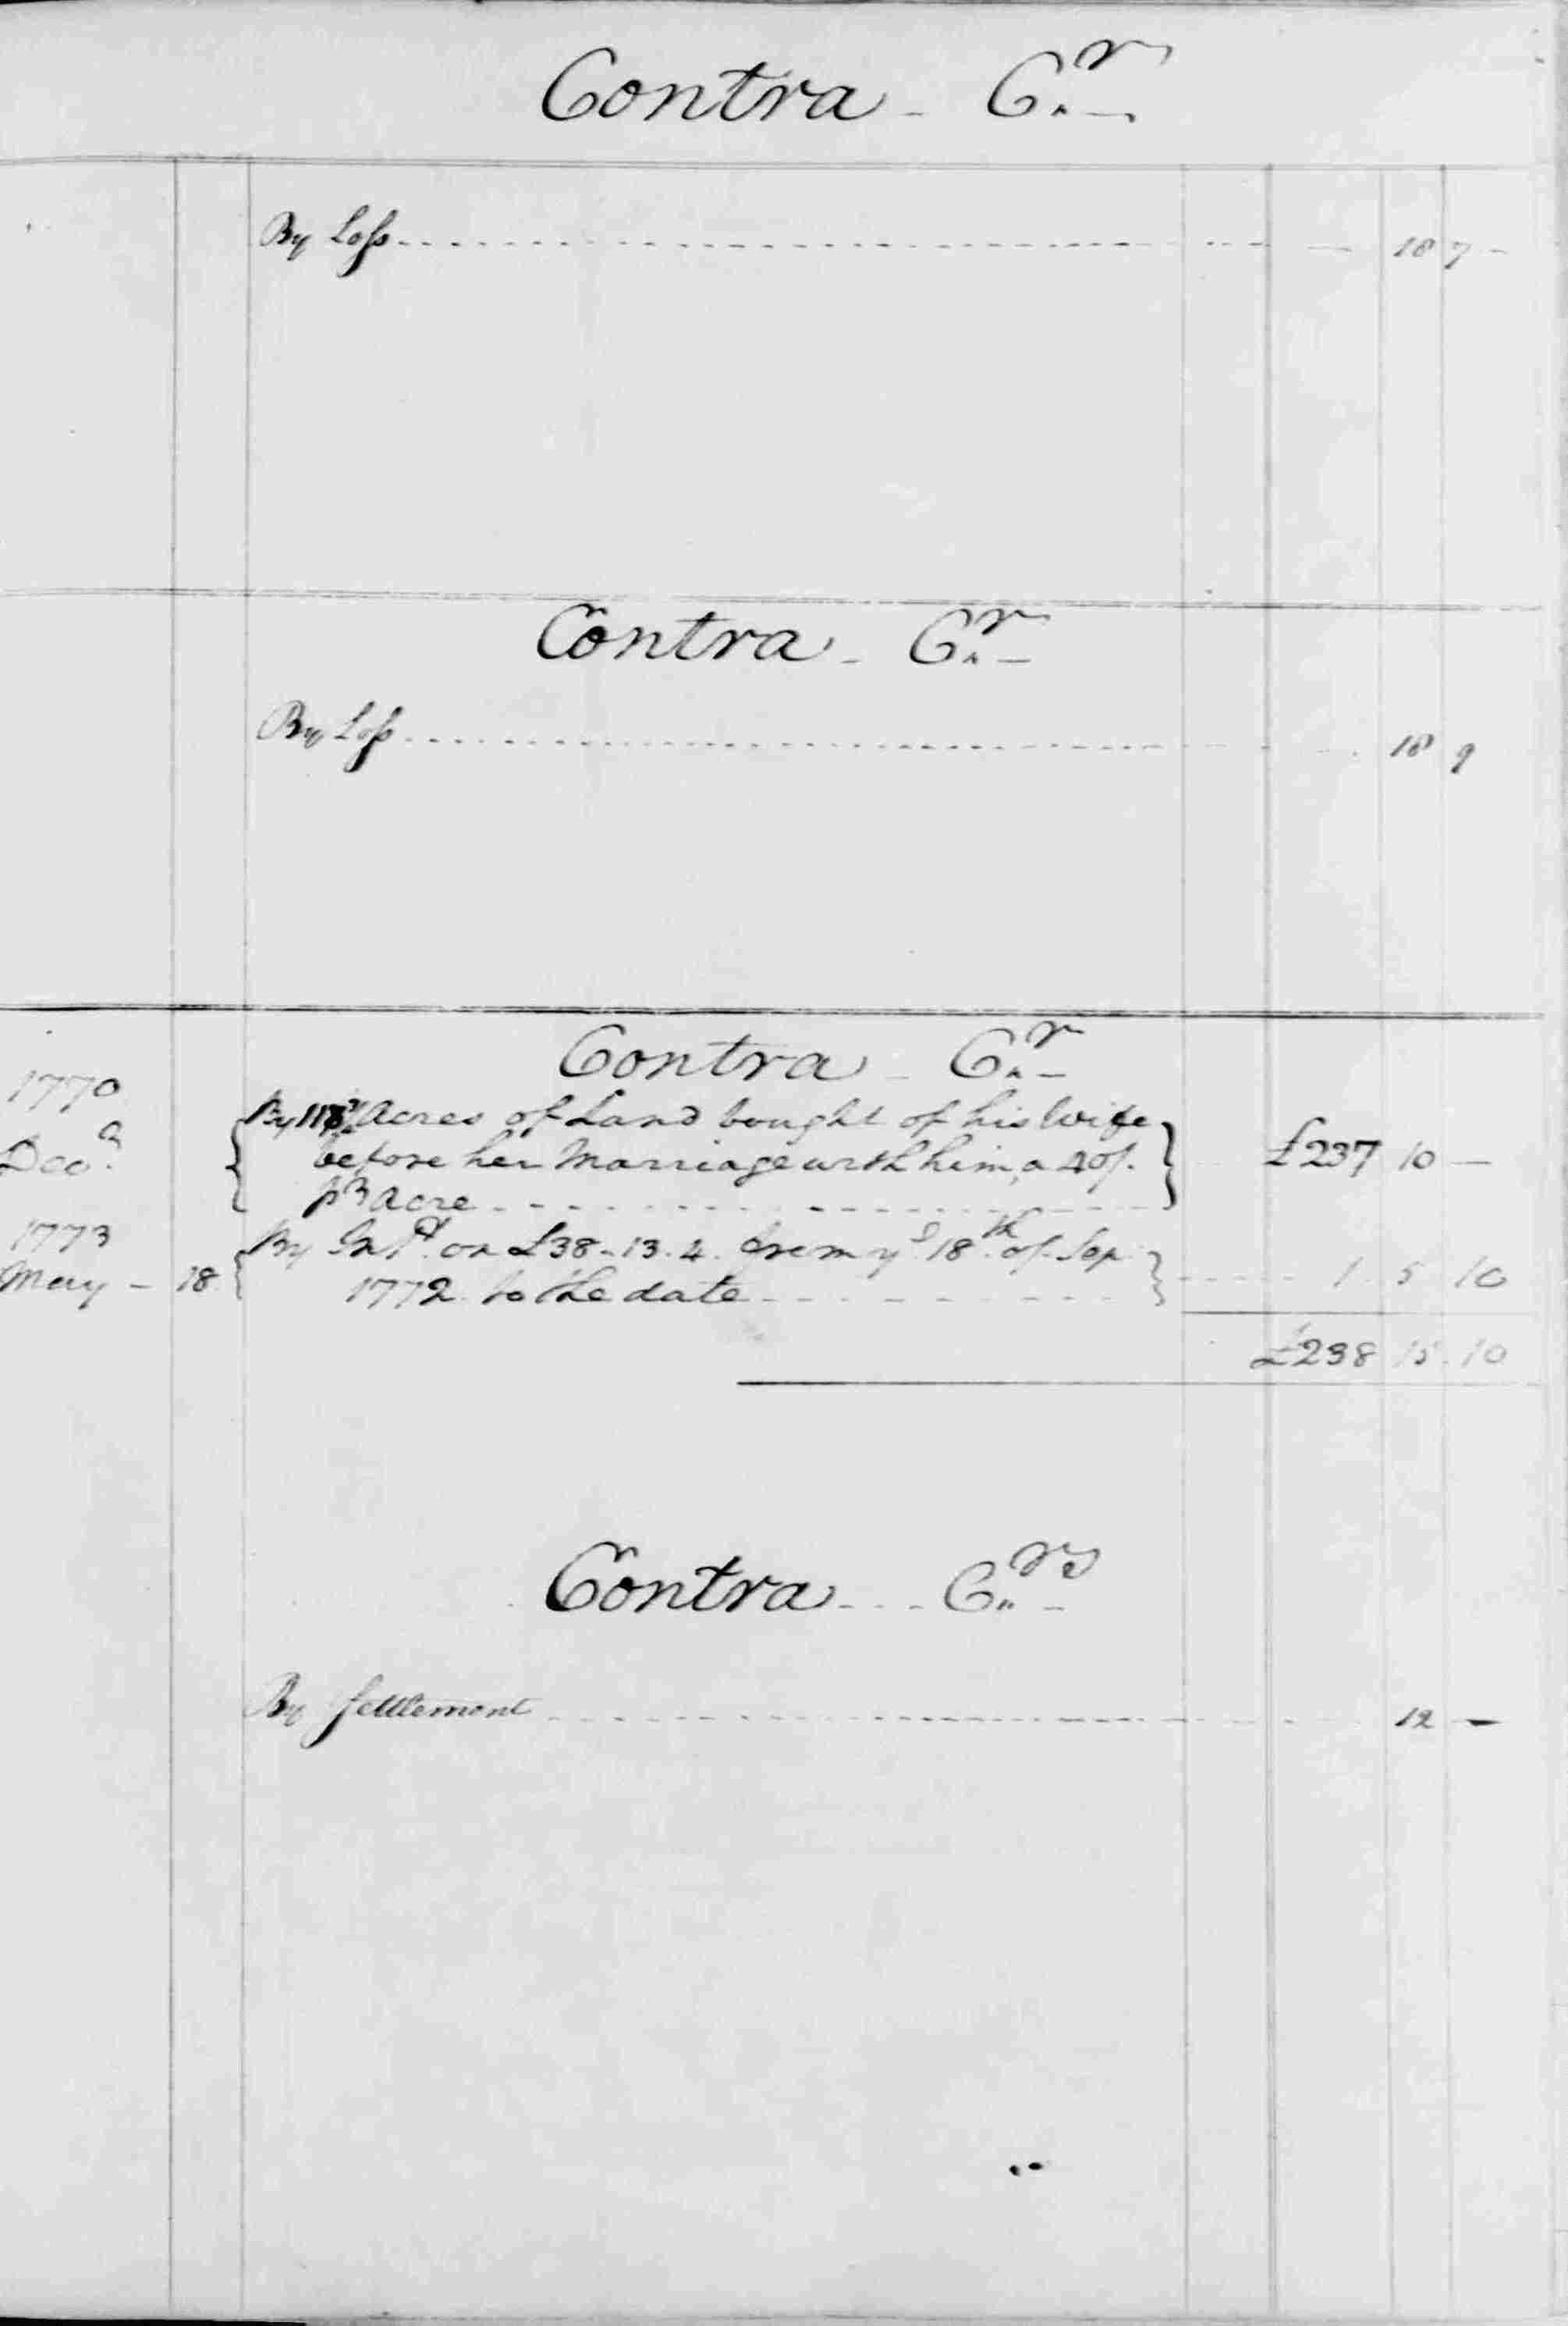 Ledger B, folio 20, right side